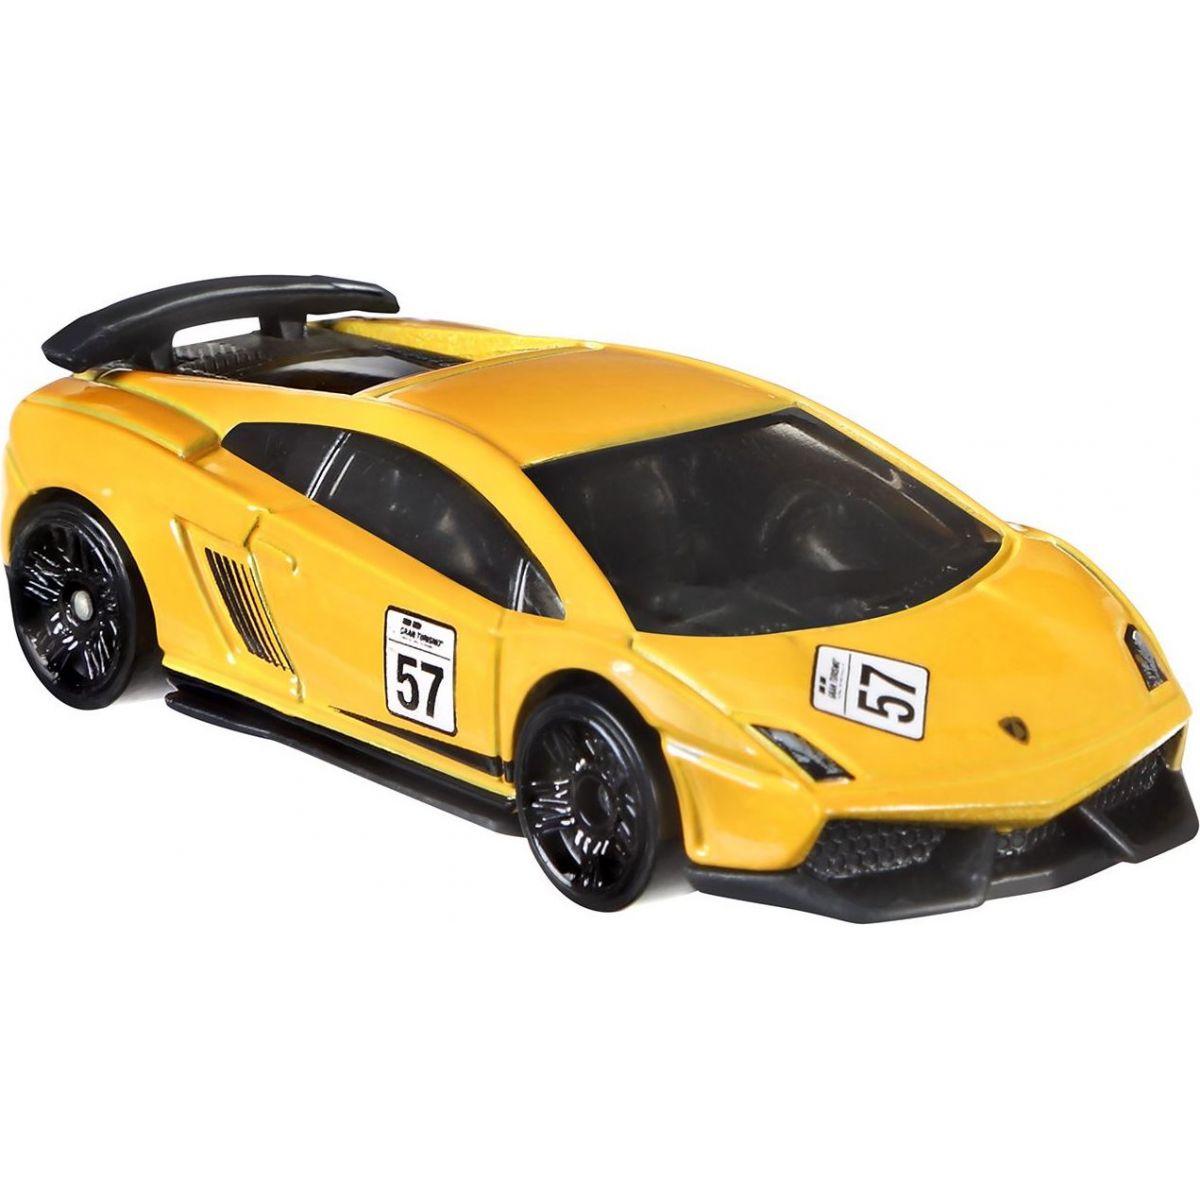 Hot Wheels angličák Grand Turismo Lamborghini Gallardo Superleggera